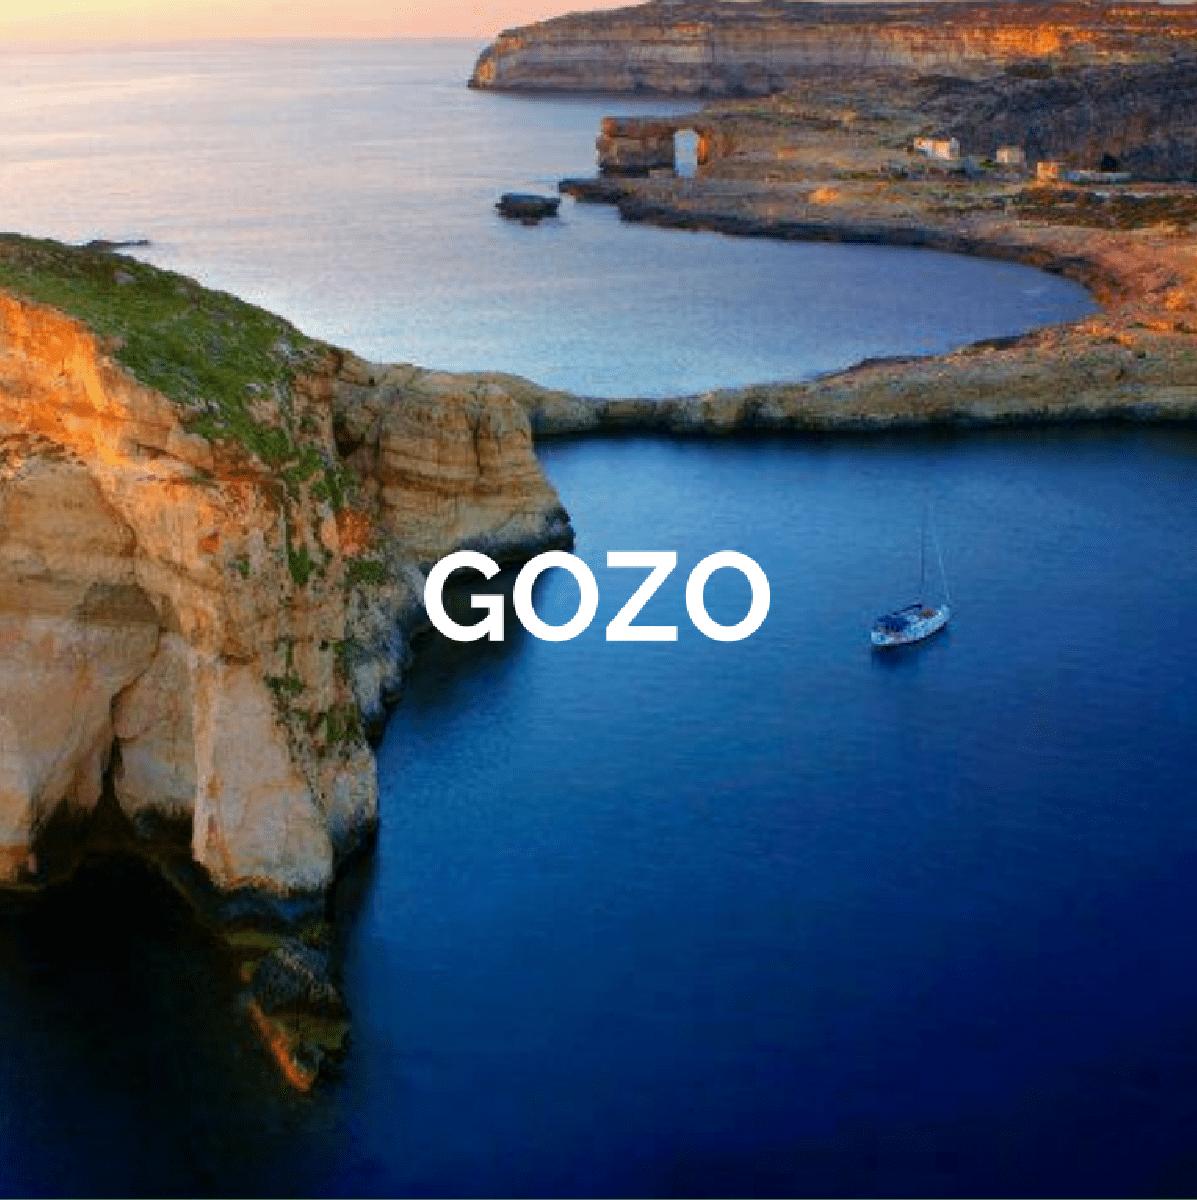 malta-yacht-charter-gozo